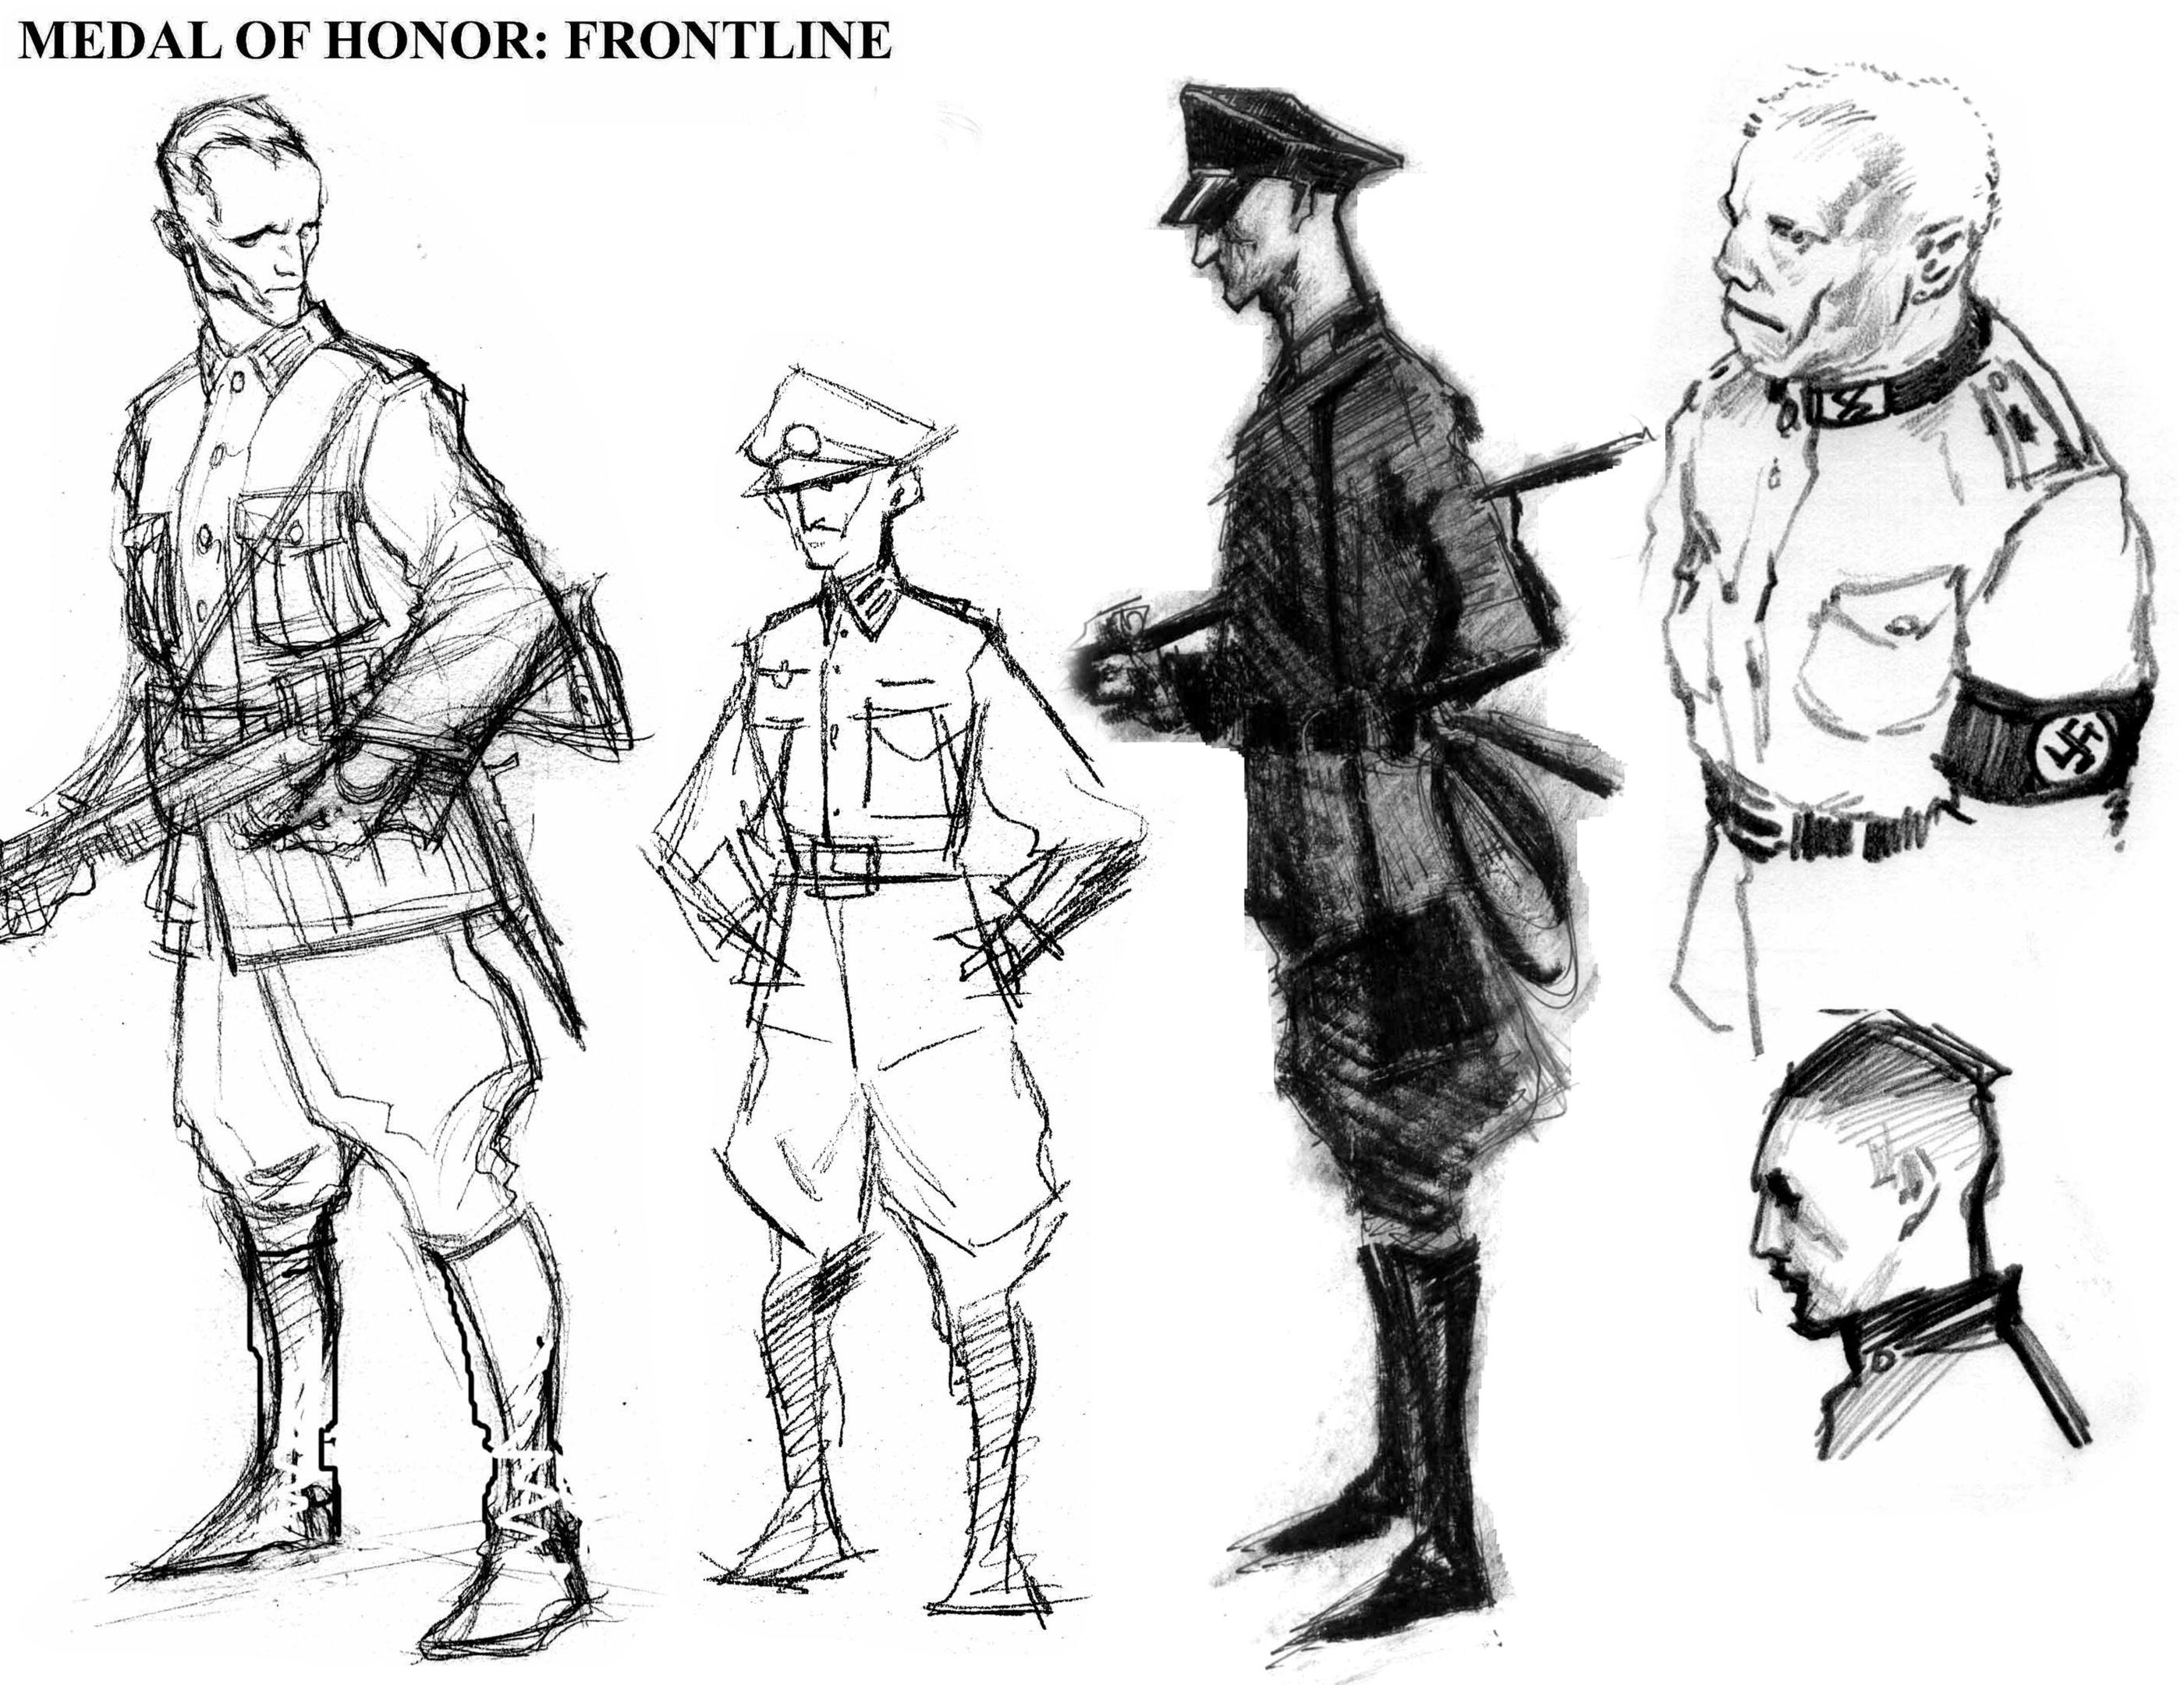 2800x2160 Medal Of Honor Frontline